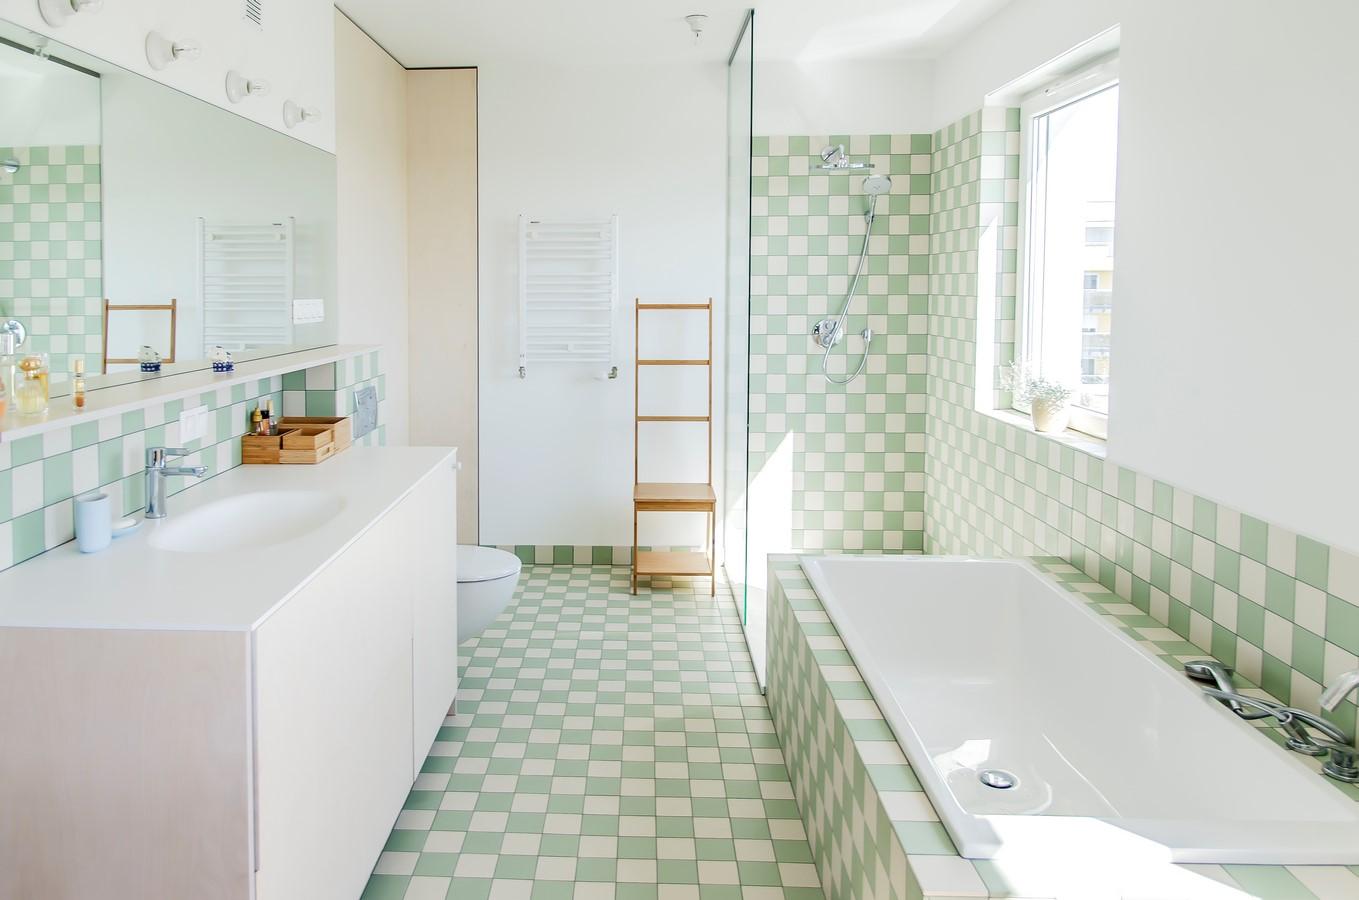 Apartment with a view by Atelier Starzak Strebicki - Sheet2